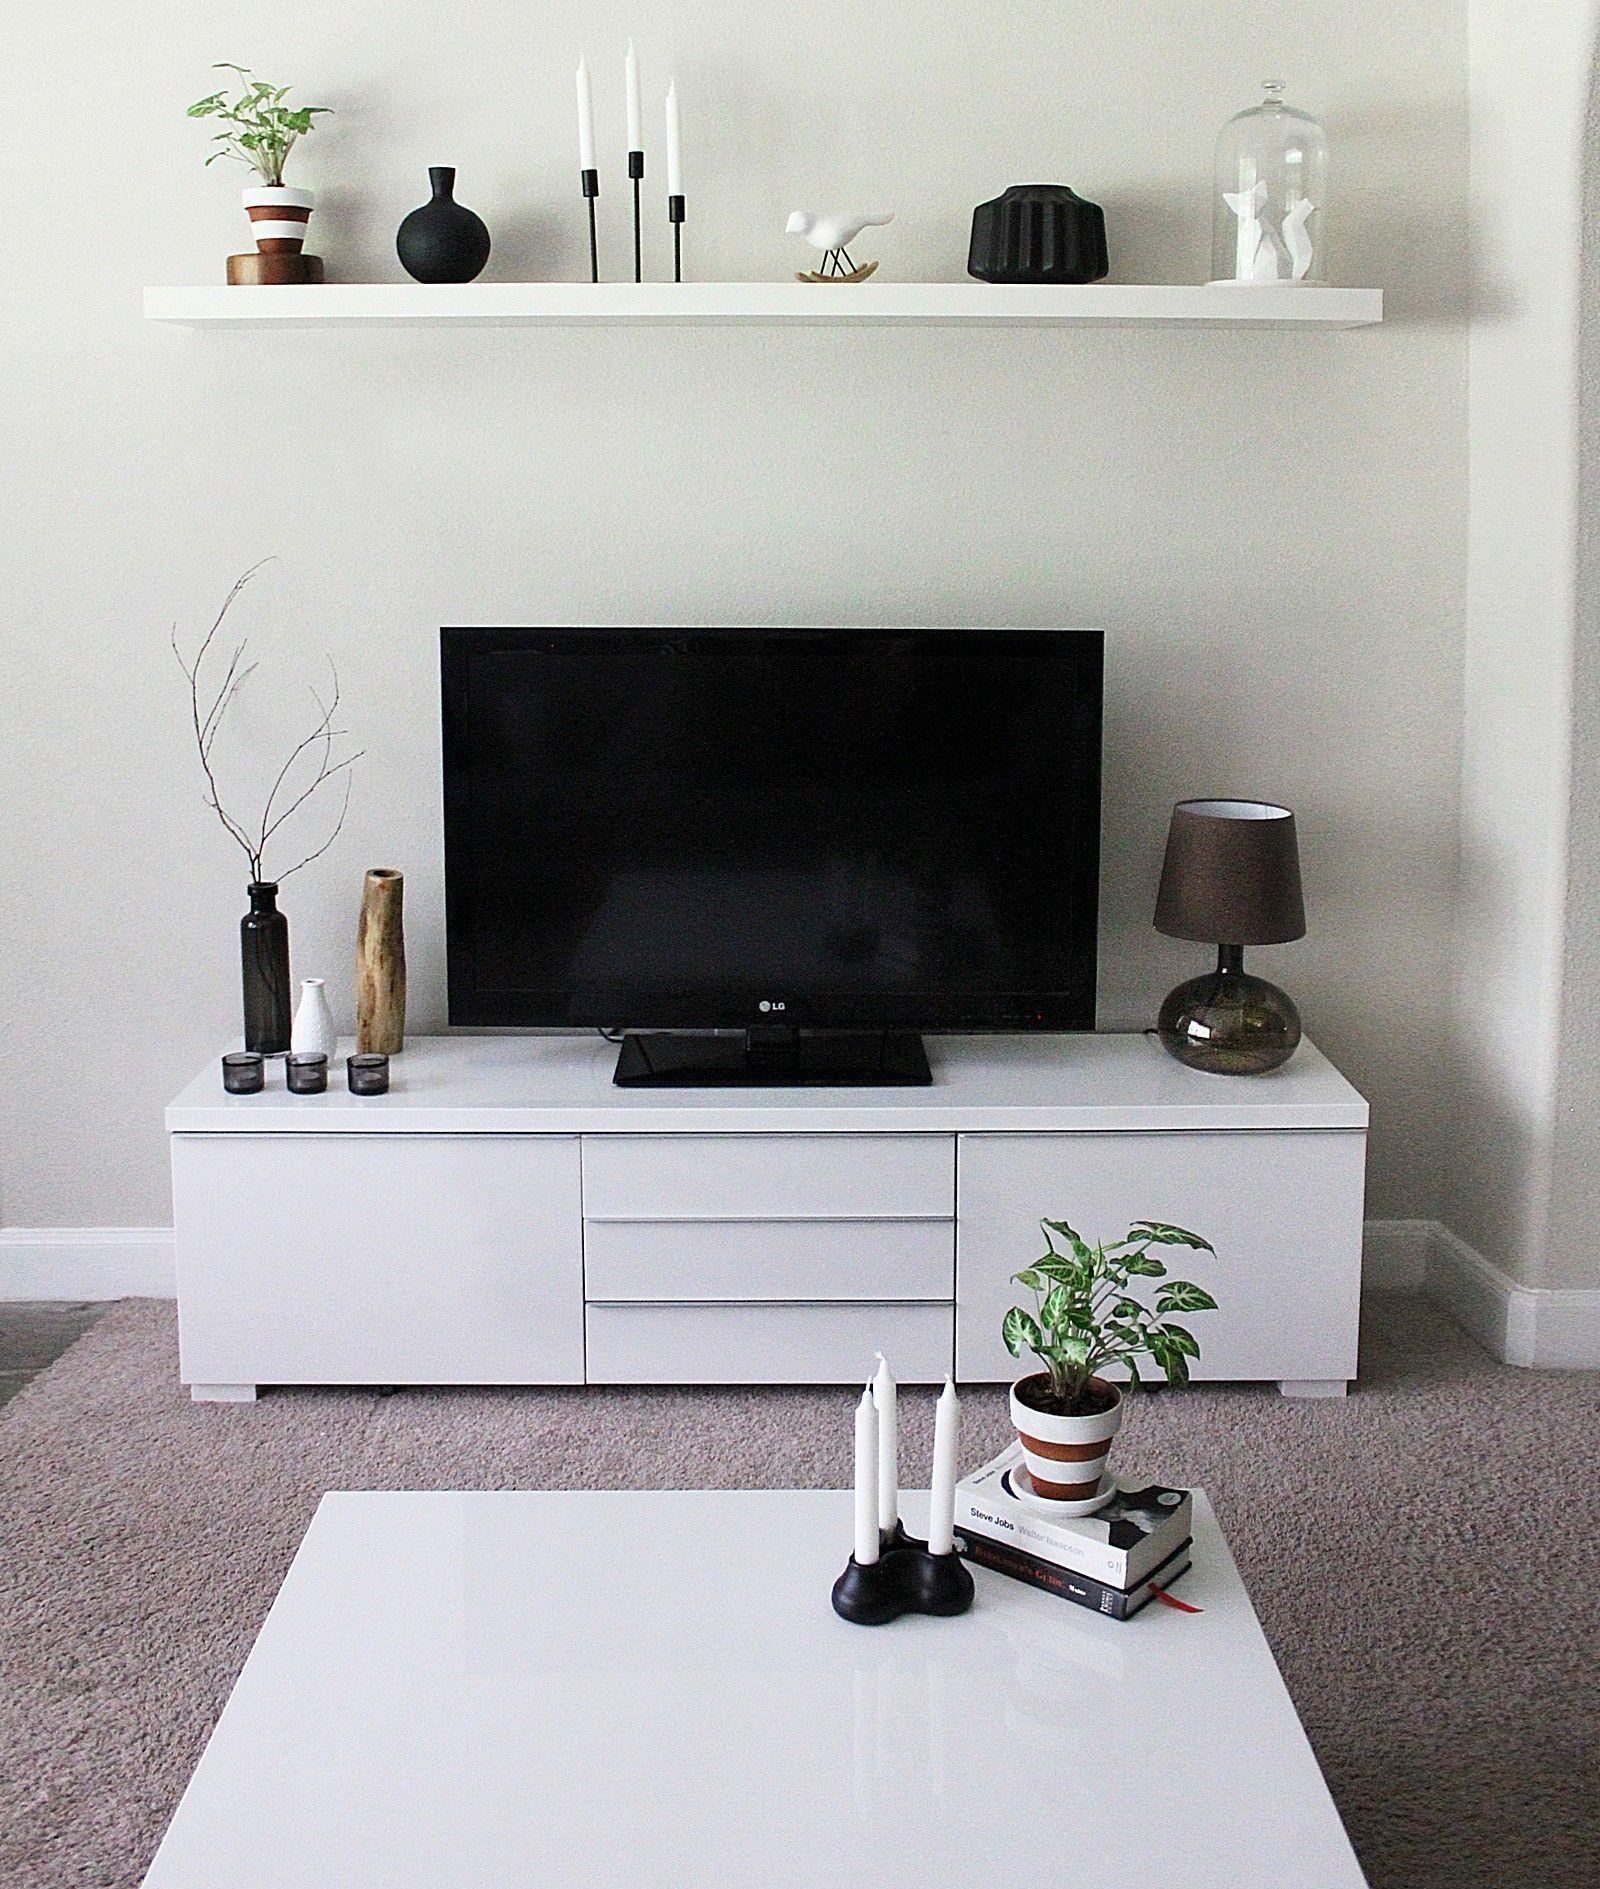 15 Stunning Minimalist Home Entrance Ideas Living Room Tv Stand Ikea Living Room Minimalist Living Room Living room television ideas